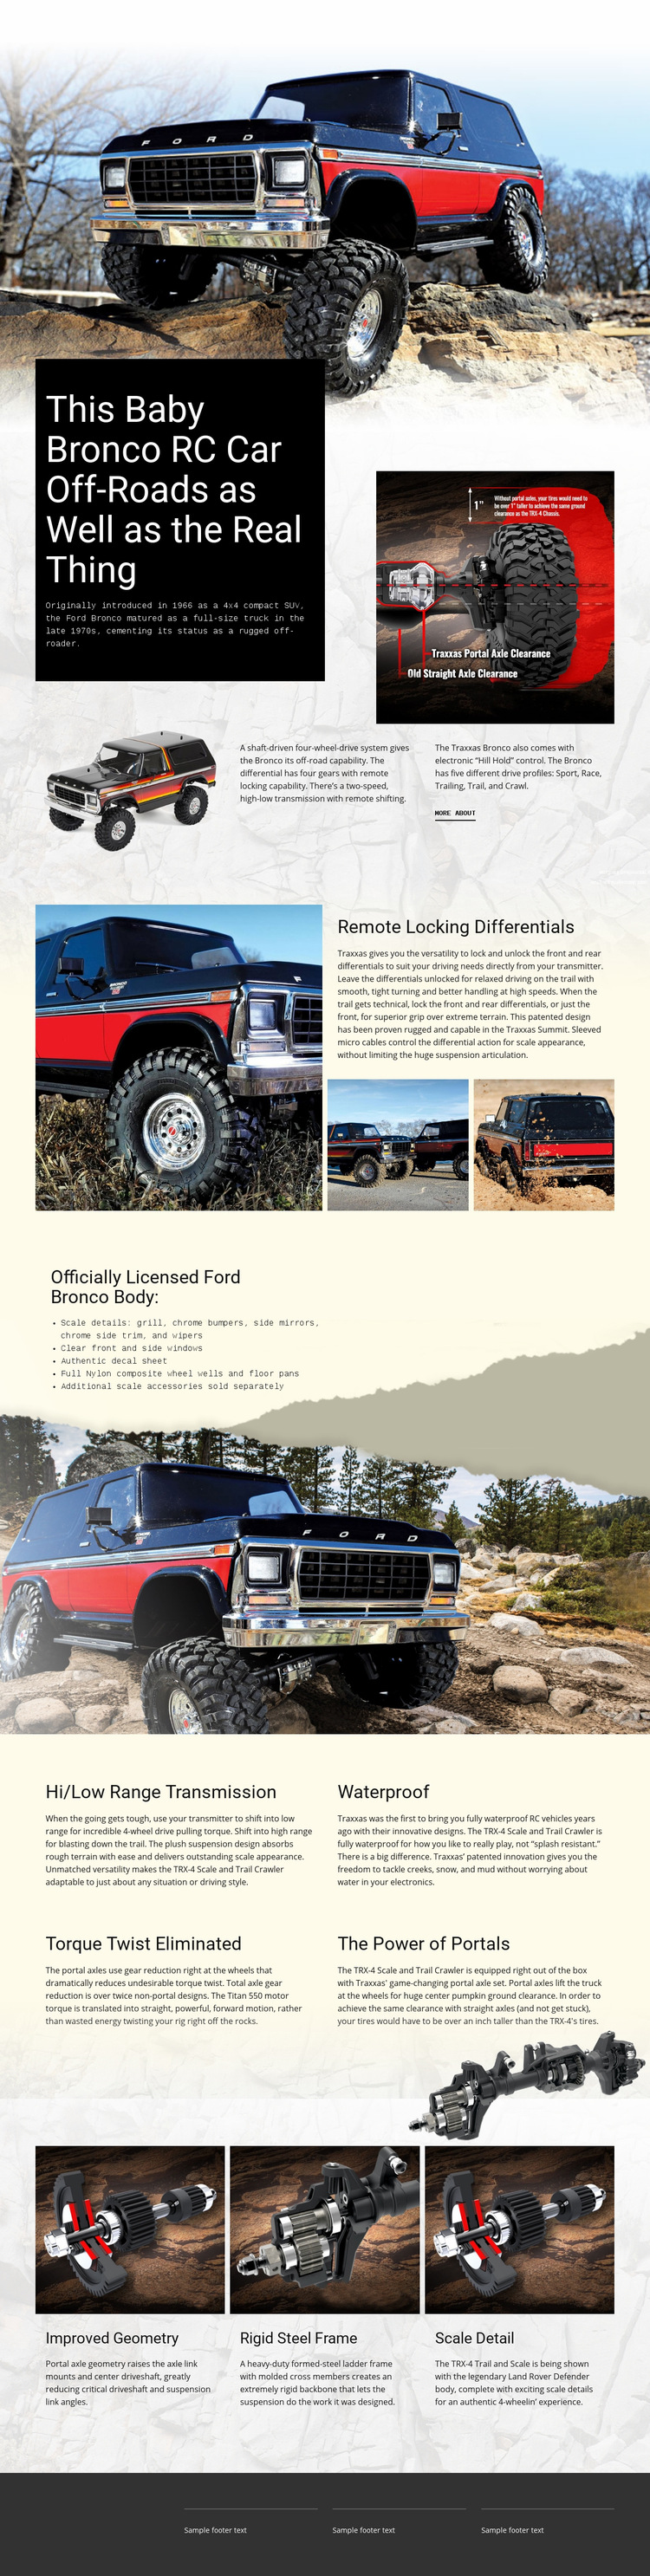 Bronco Rc Car Web Page Design